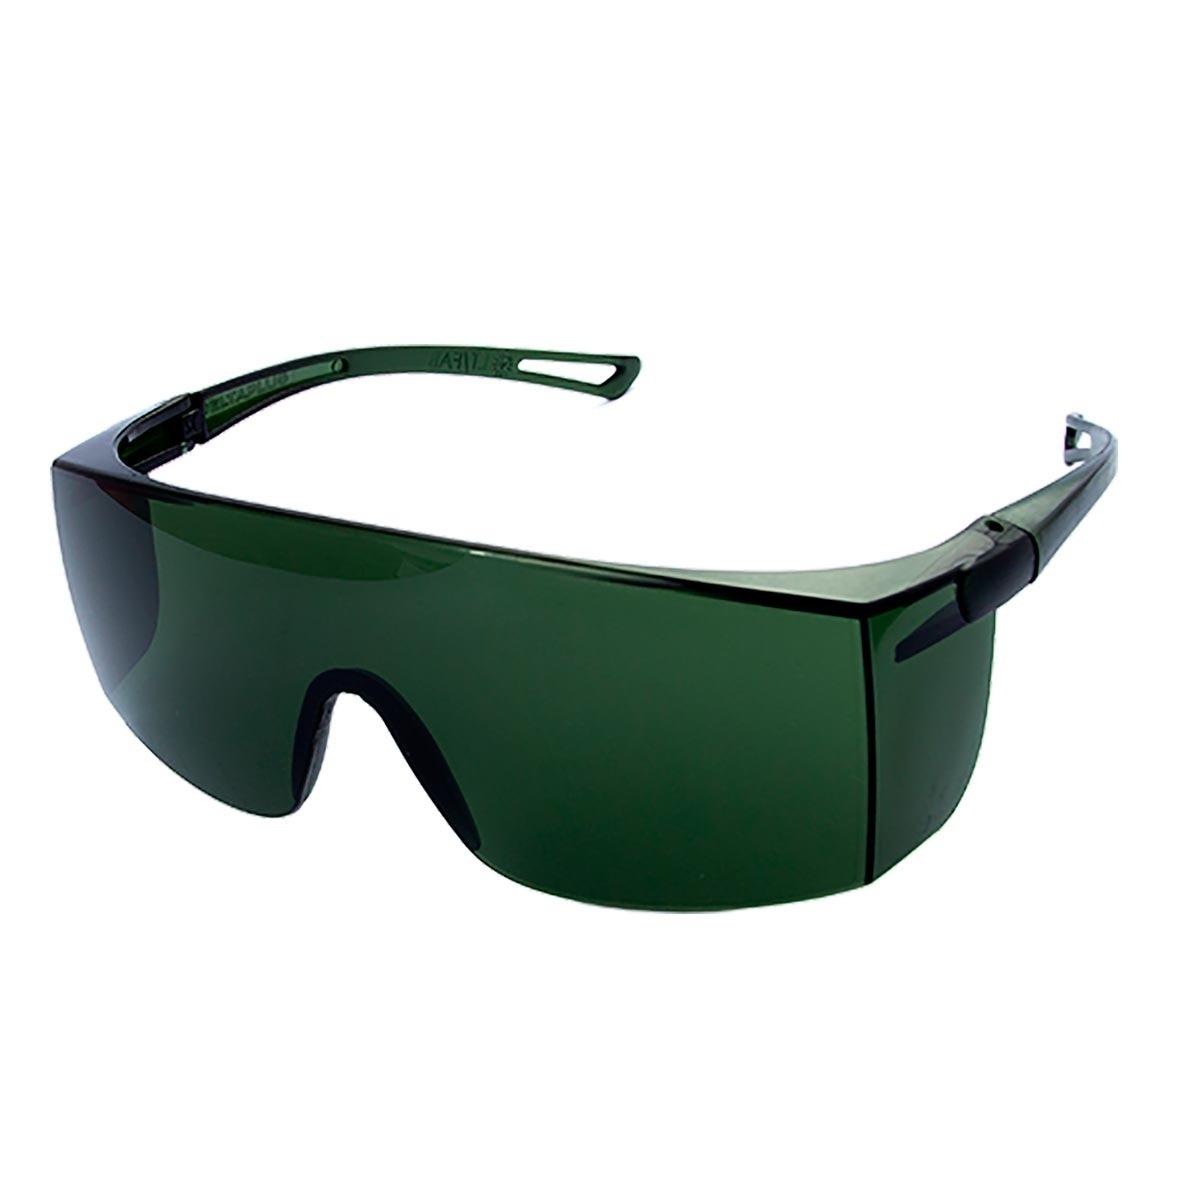 Óculos De Proteção Delta Plus Sky Rayban - Ca 39.878 - R  8,58 em ... 8a780d0060